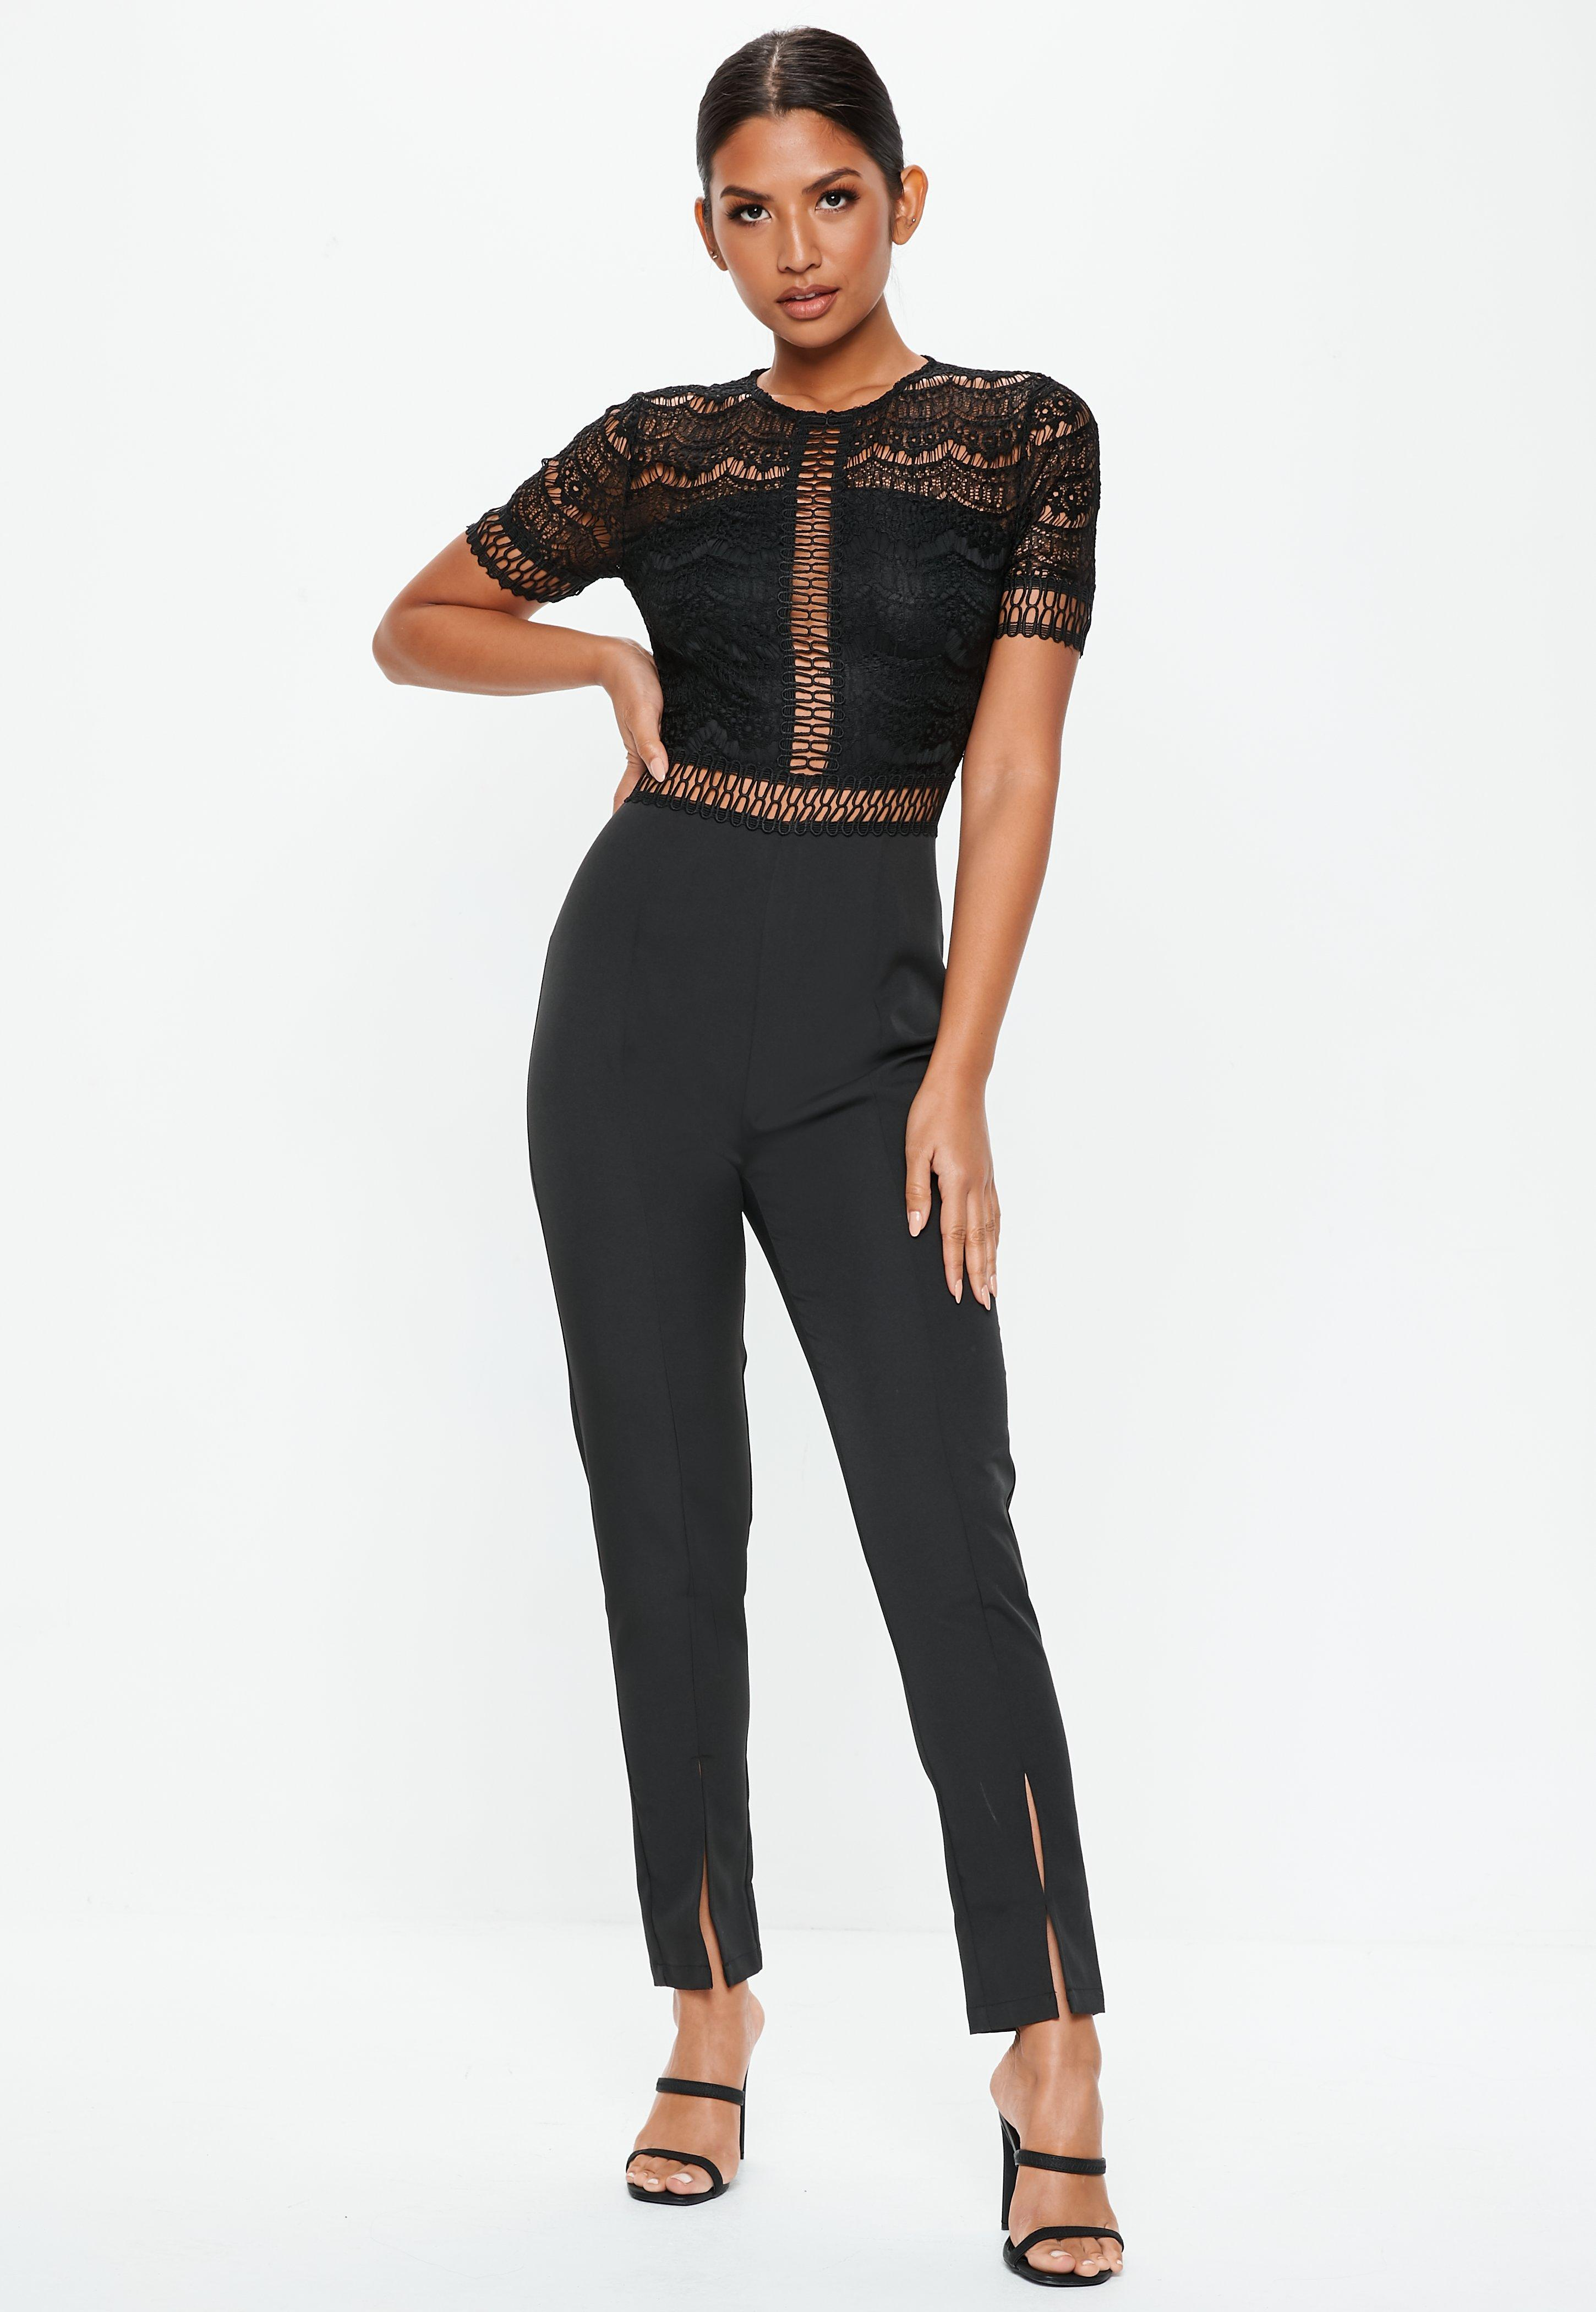 d64daf53afd9 Lyst - Missguided Black Lace Top Cigarette Trouser Jumpsuit in Black